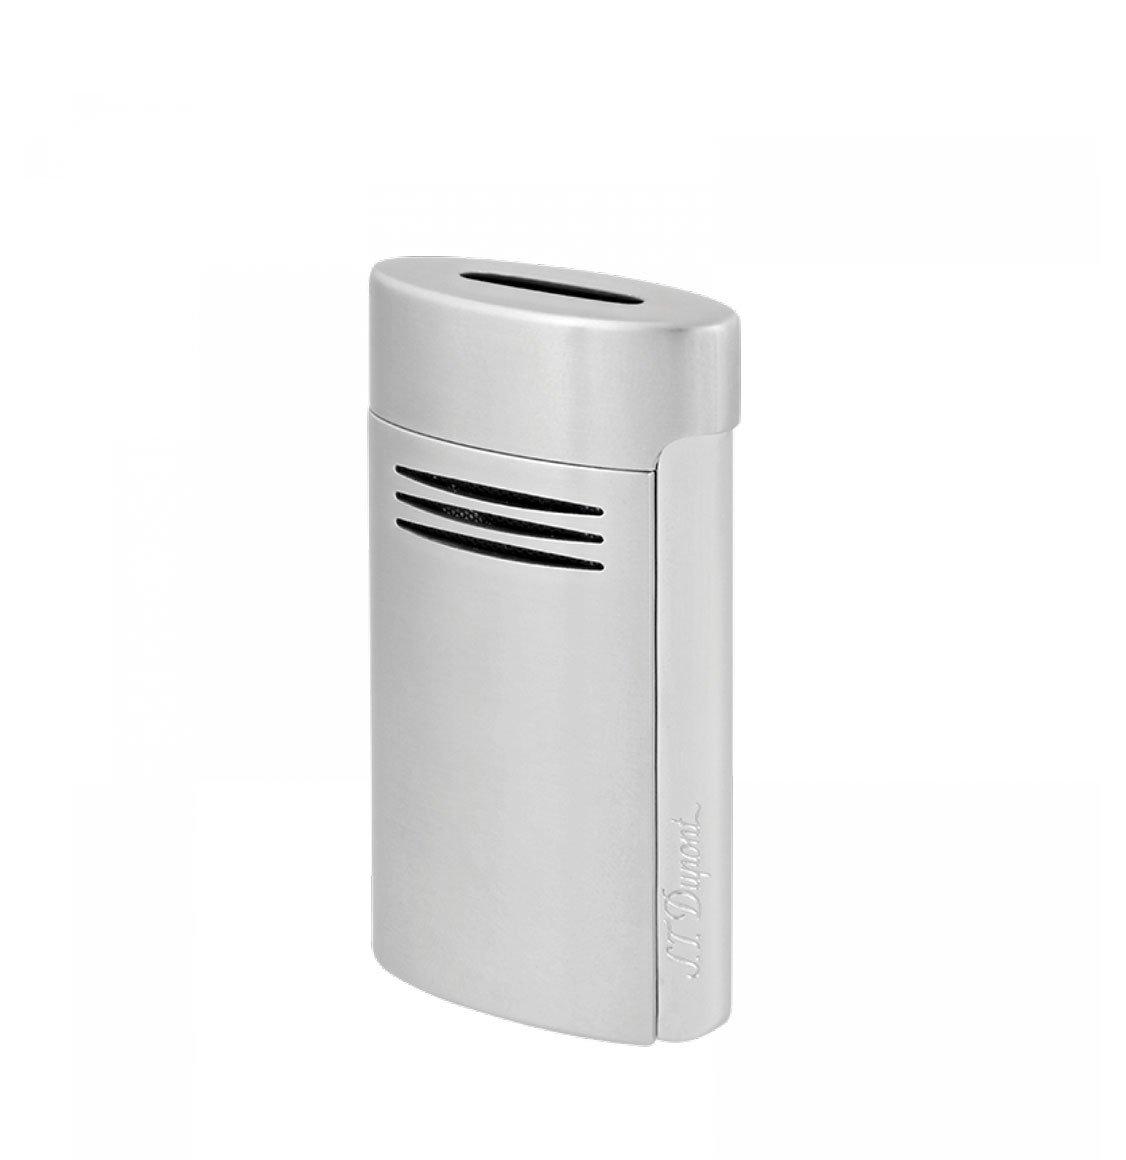 S.T. Dupont Αναπτήρας Megajet Chrome Lighter